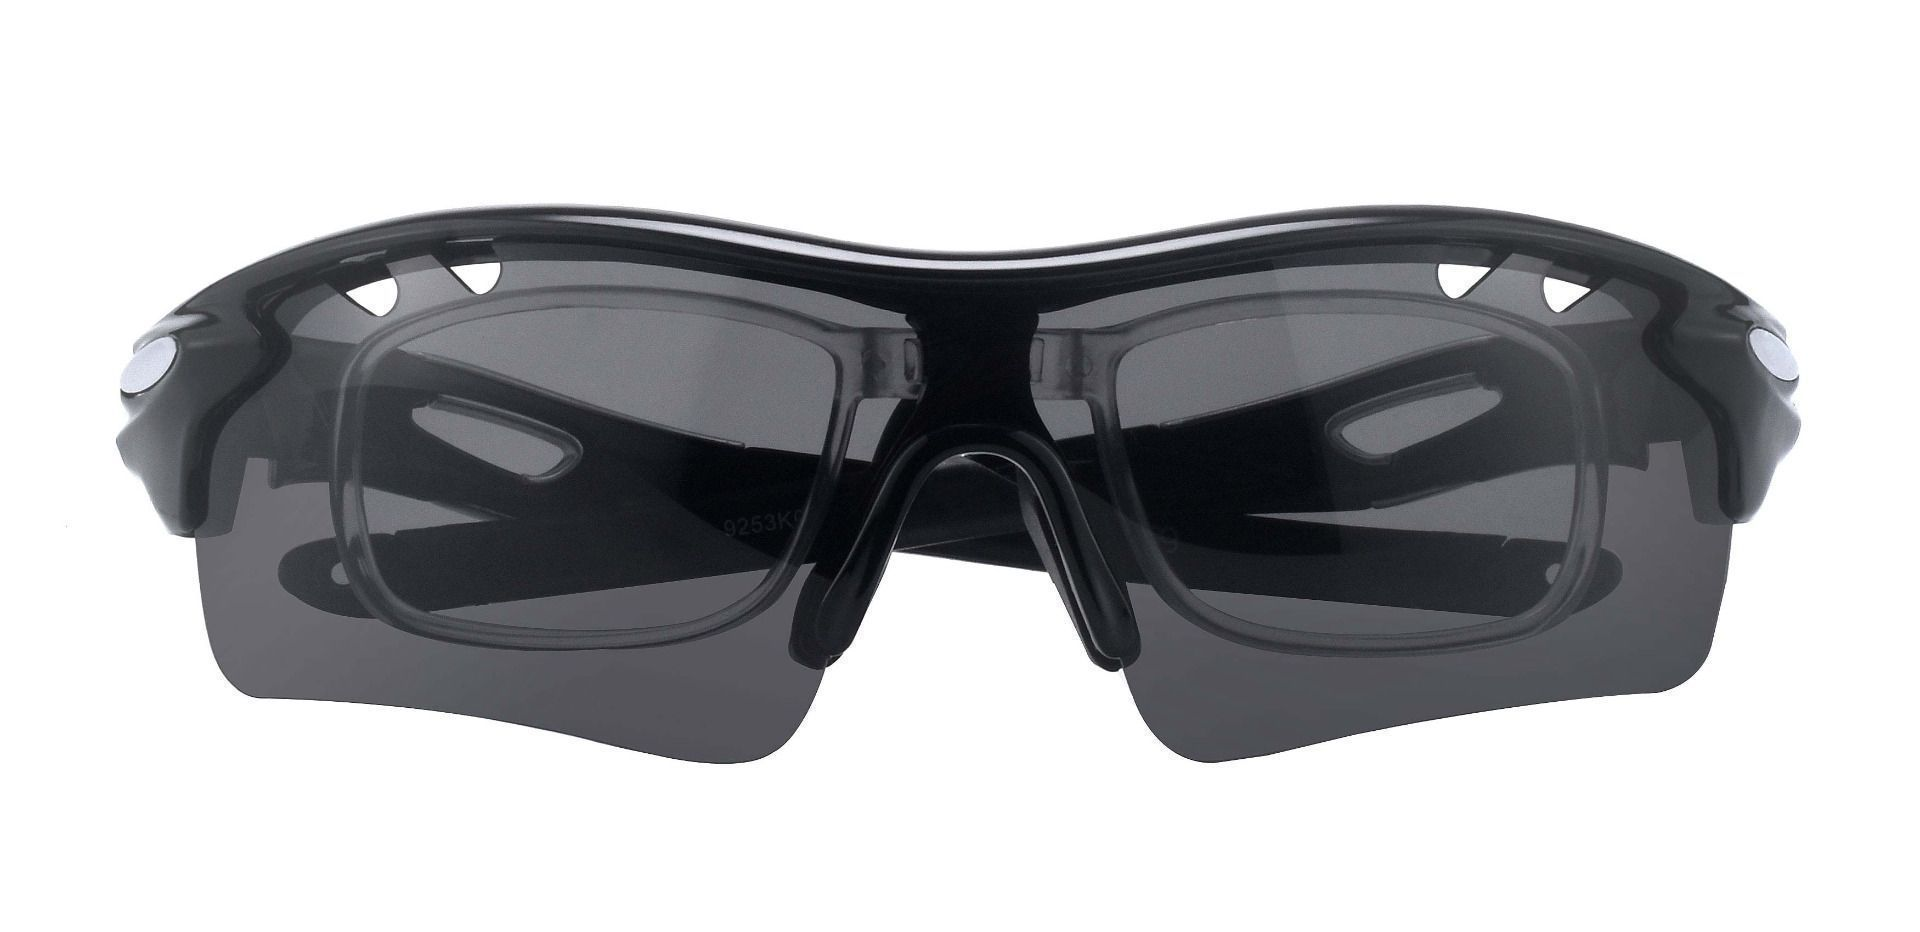 Jackson Sport Glasses Prescription Glasses - Black